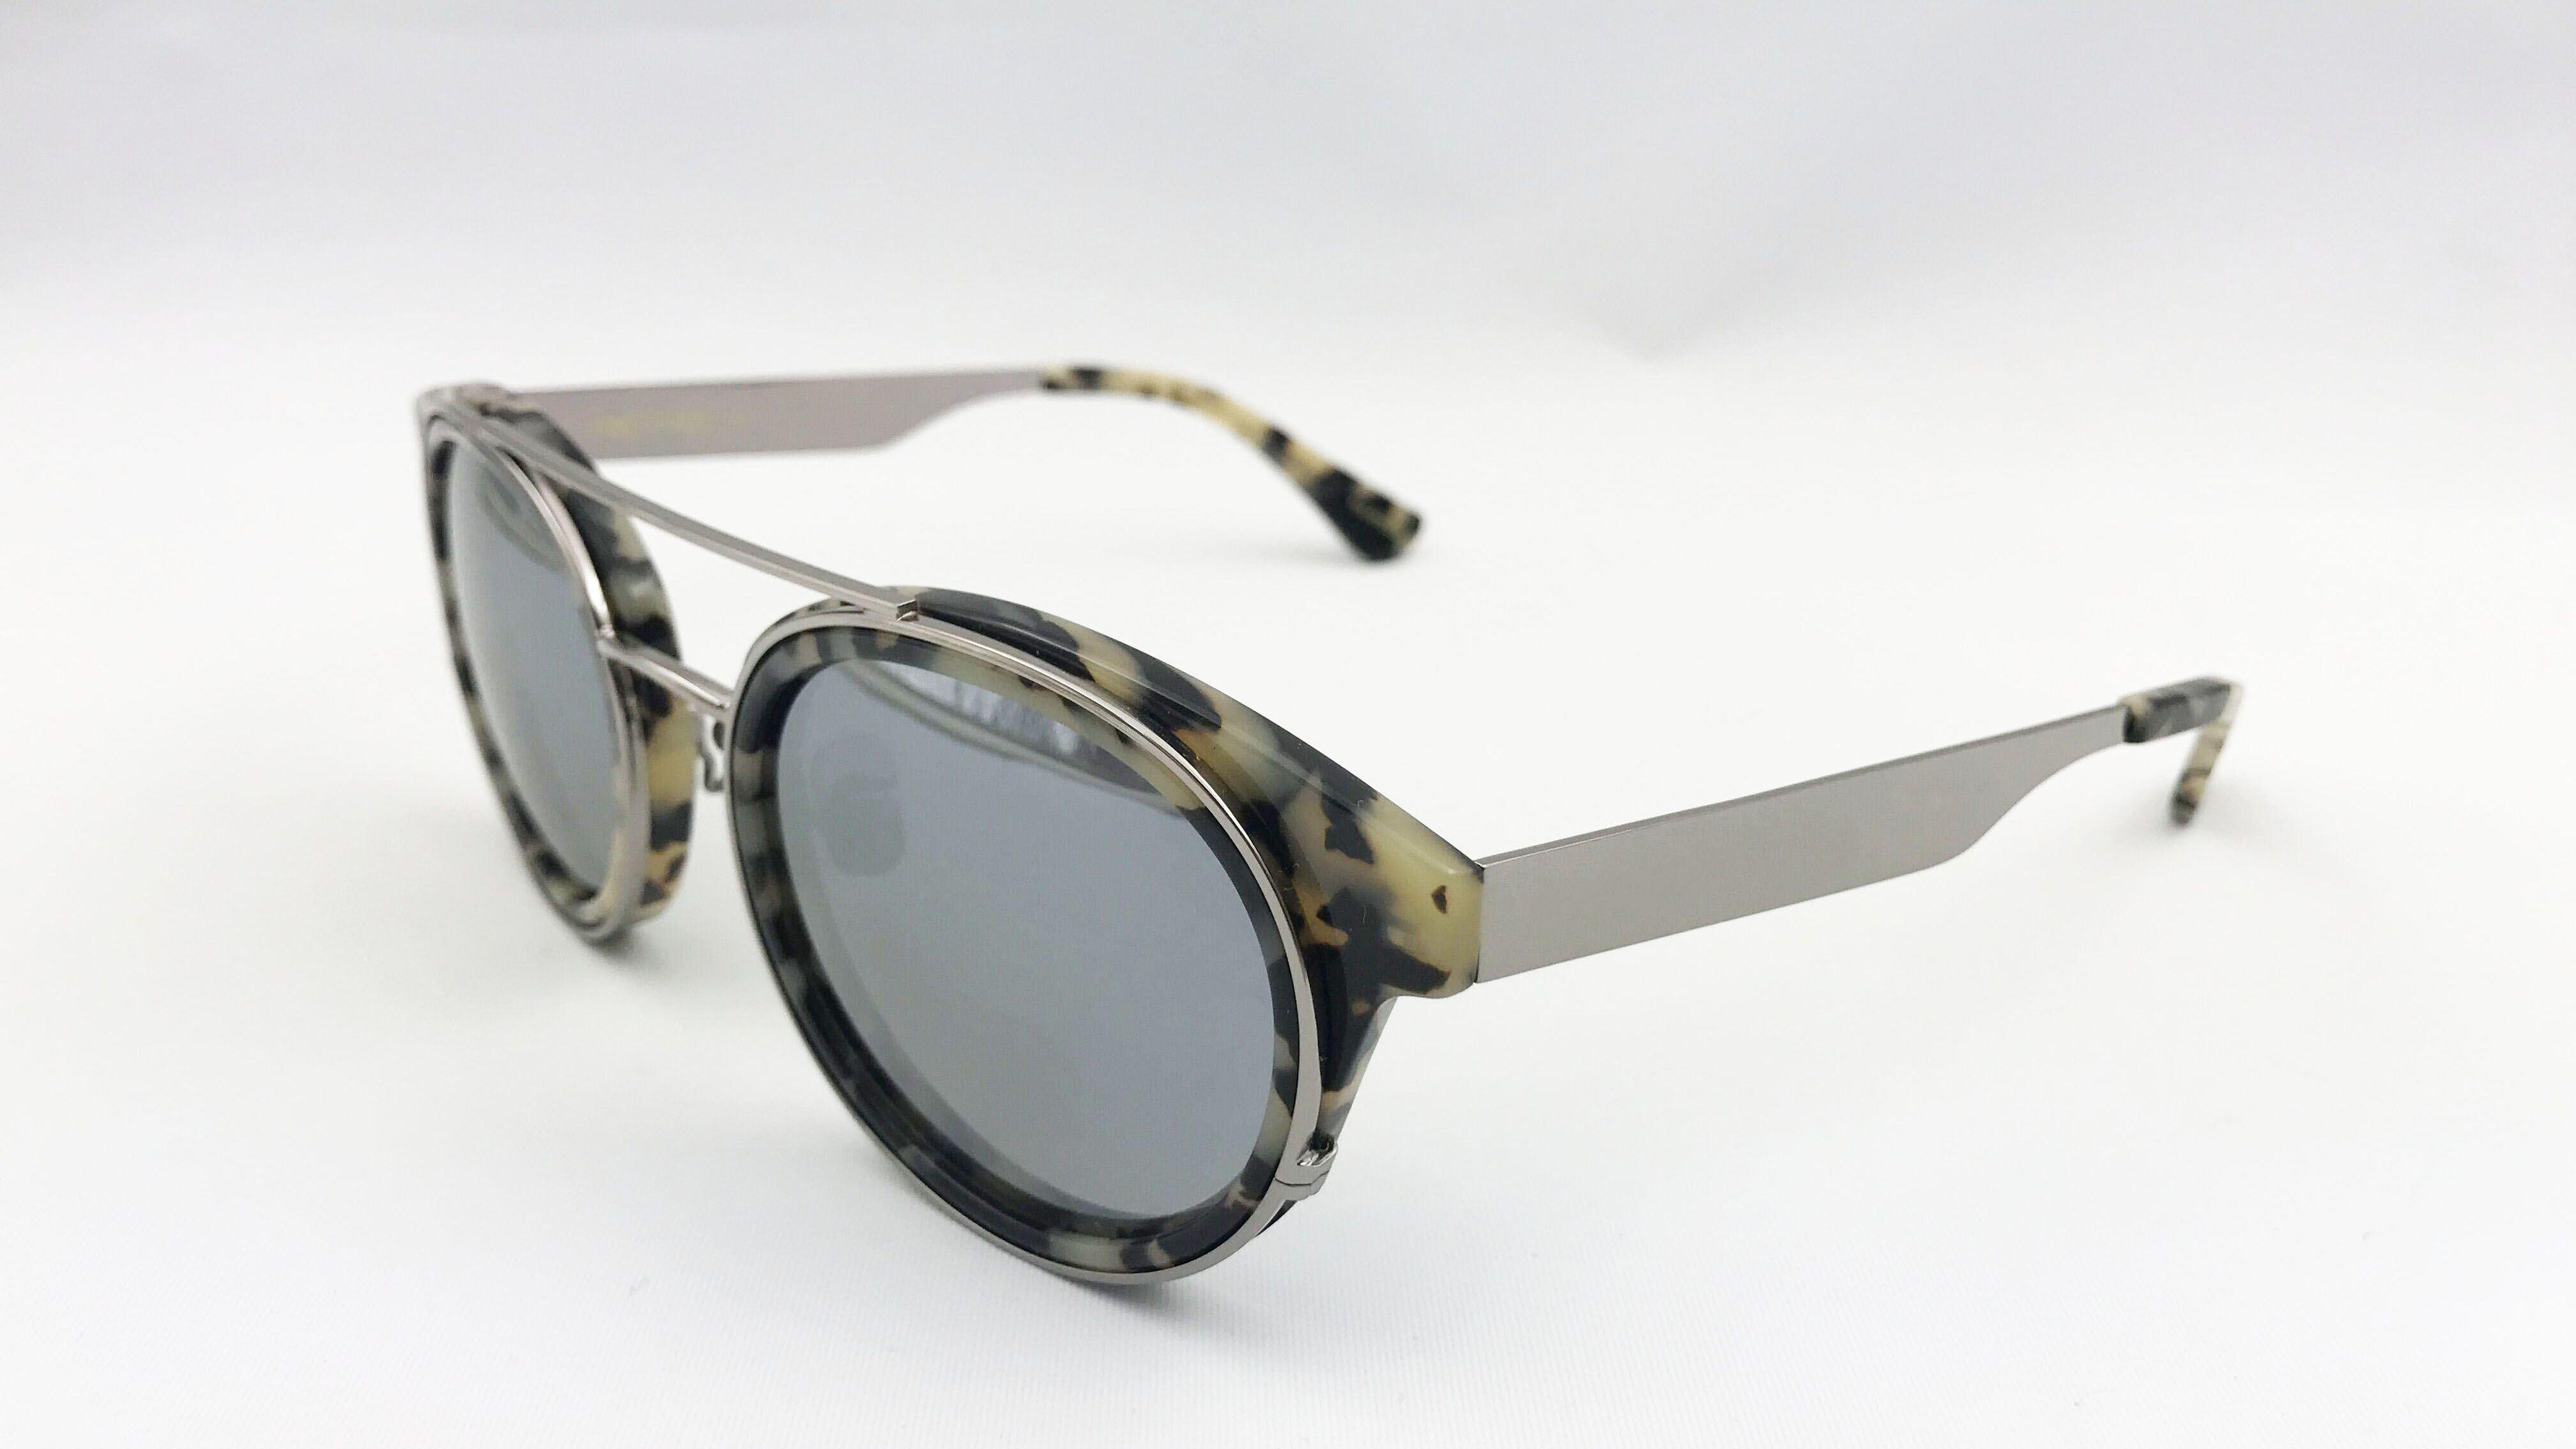 Unique Design Acetate& Metal &Sunglasses for Lady and Man.